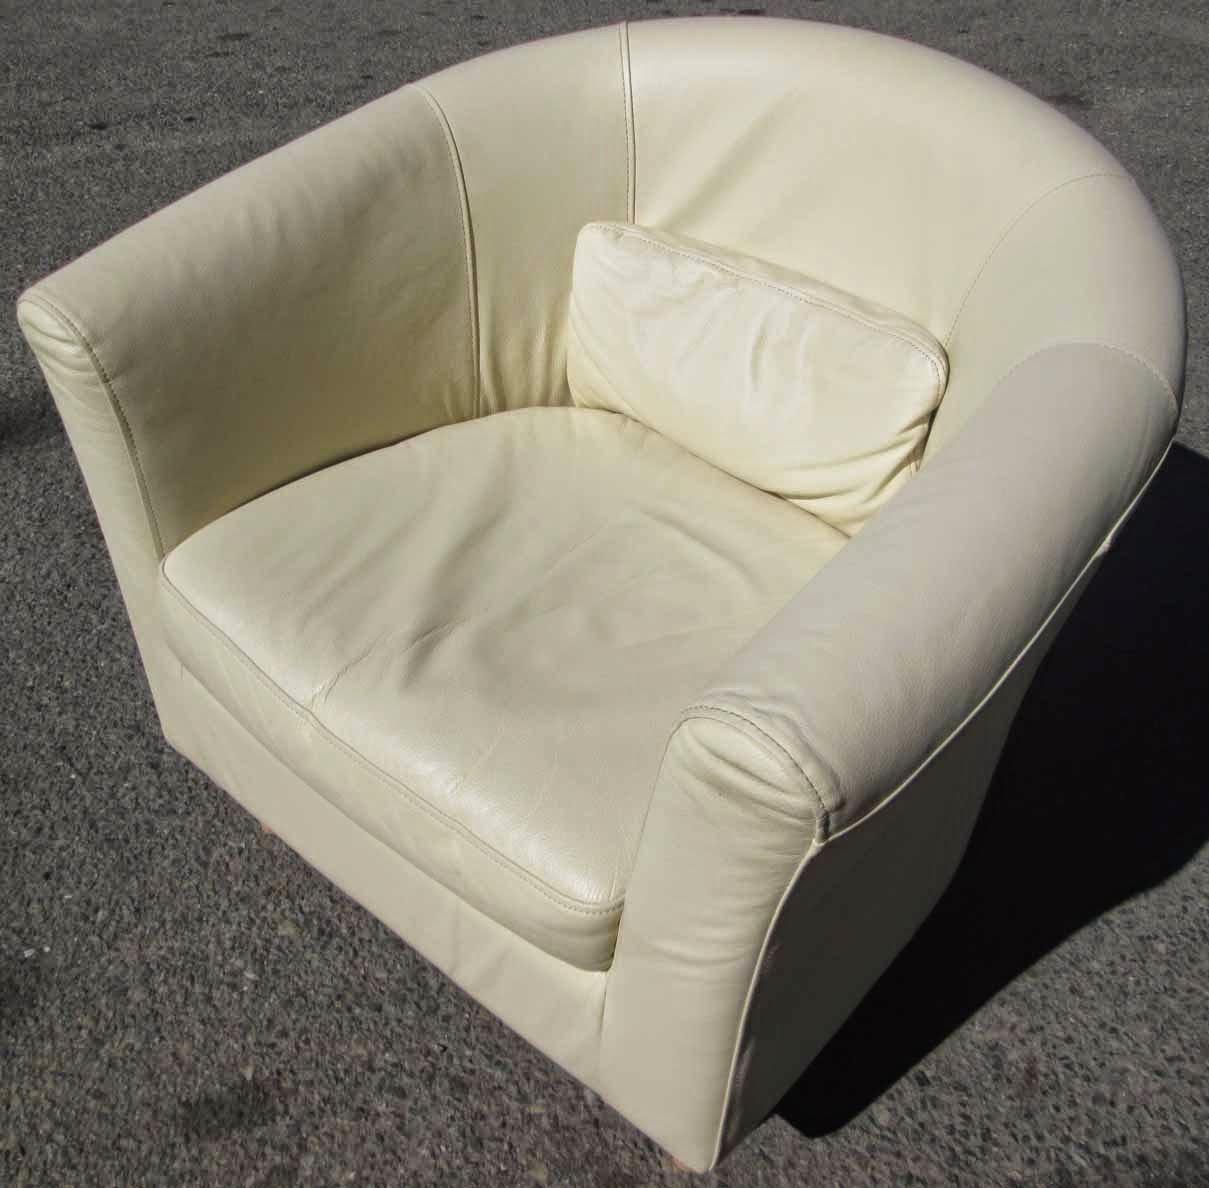 UHURU FURNITURE & COLLECTIBLES SOLD Ikea Lounge Chair $55